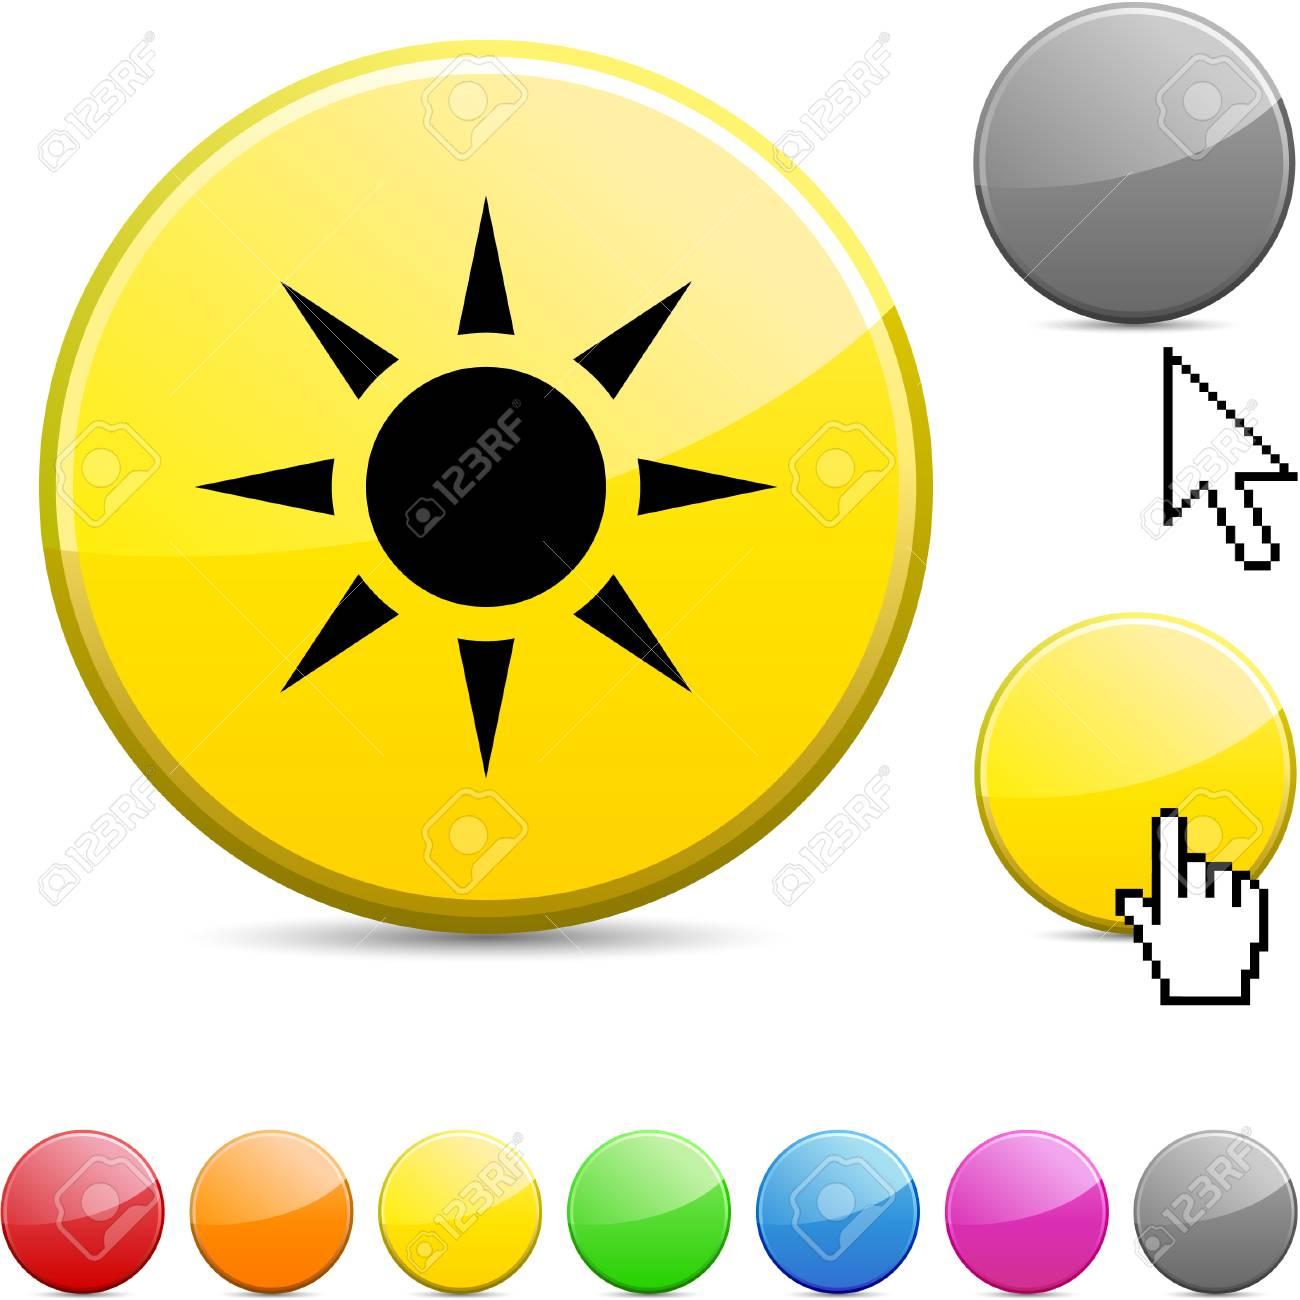 Sun glossy vibrant round icon. Stock Vector - 7195315